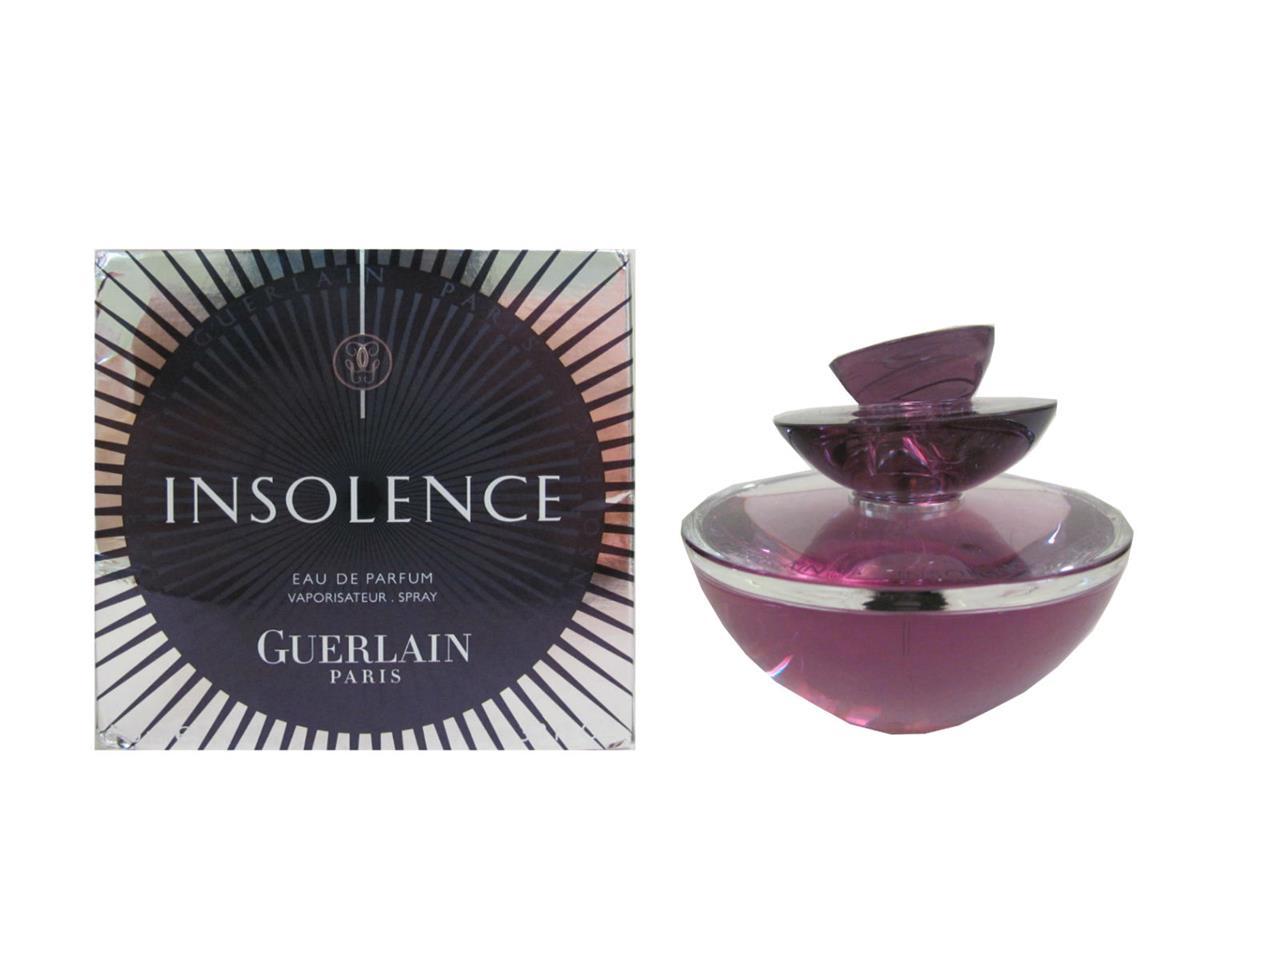 insolence 3 3 oz eau de parfum spray for women no cellophane wrap by guerlain ebay. Black Bedroom Furniture Sets. Home Design Ideas